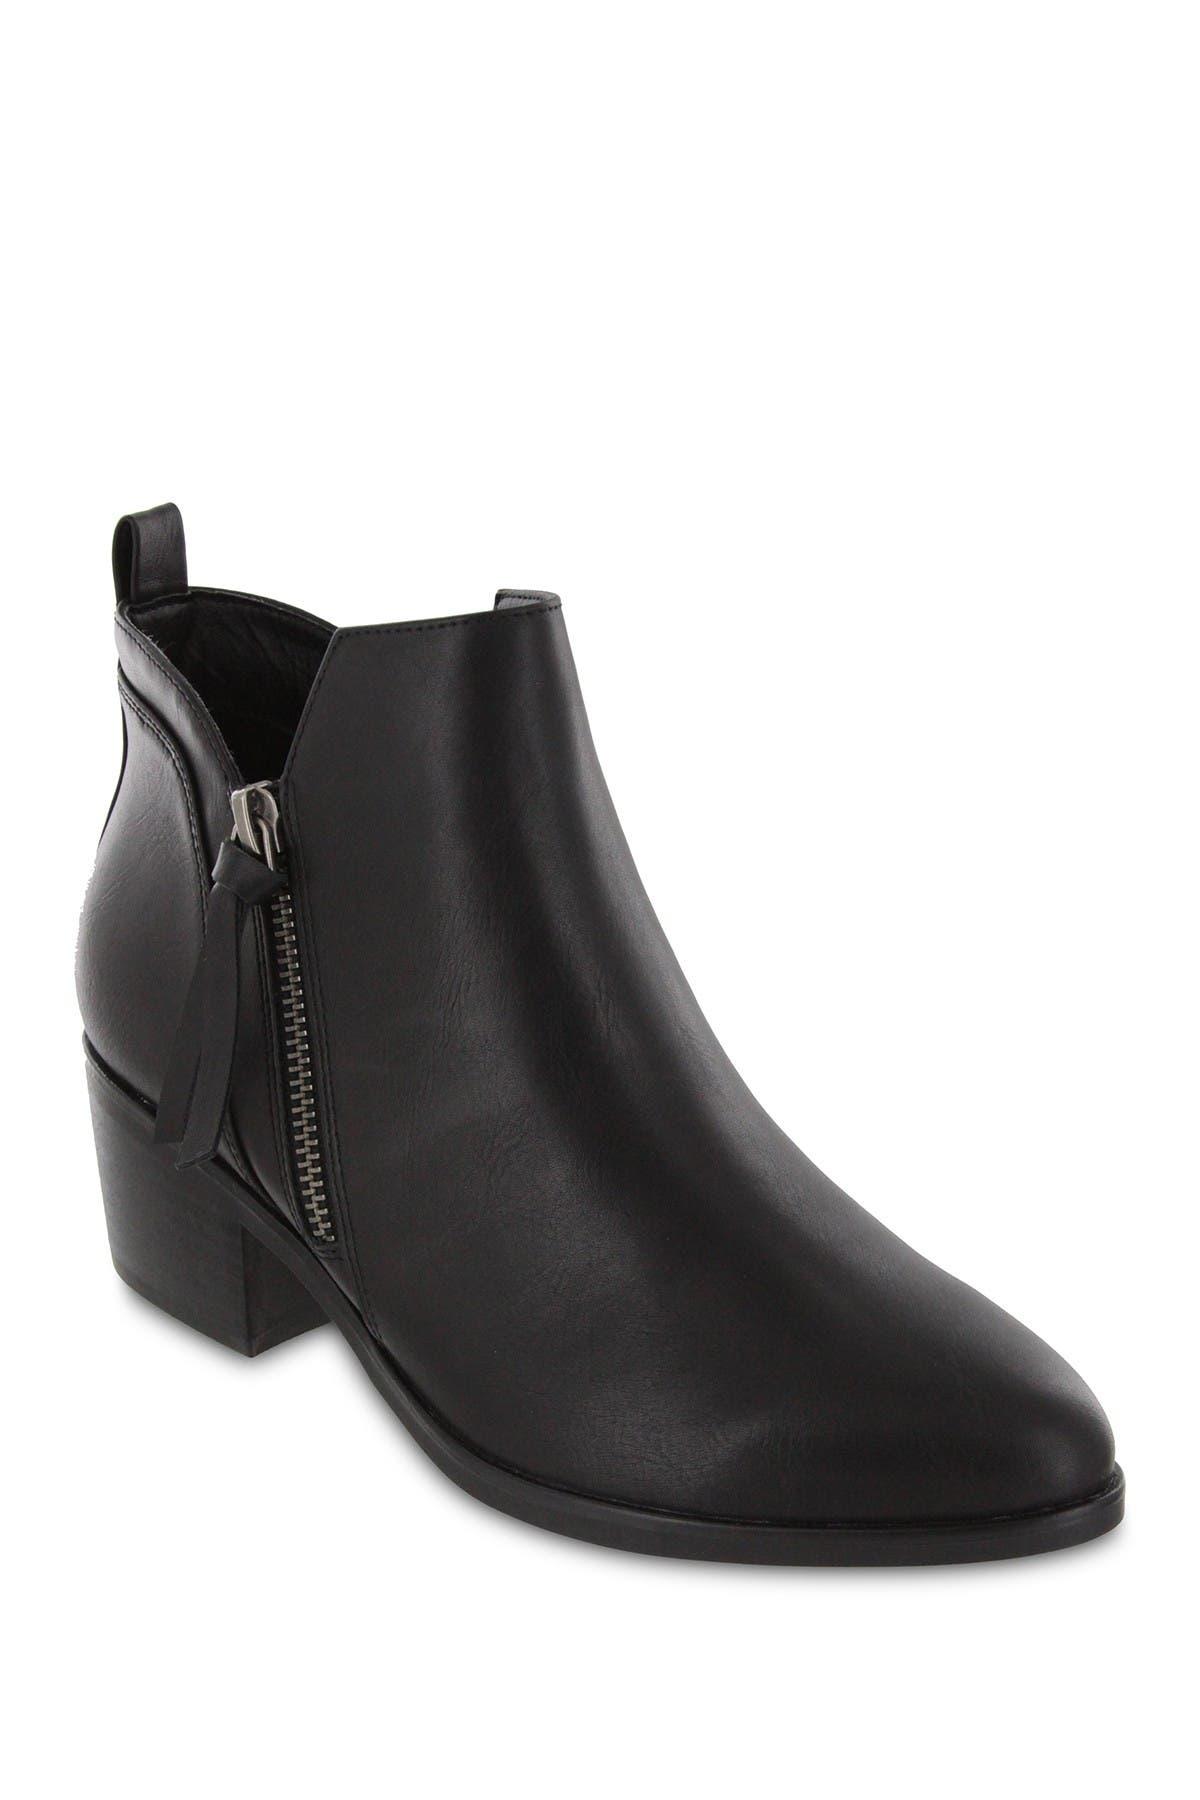 Image of MIA Auden Side Zipper Boot